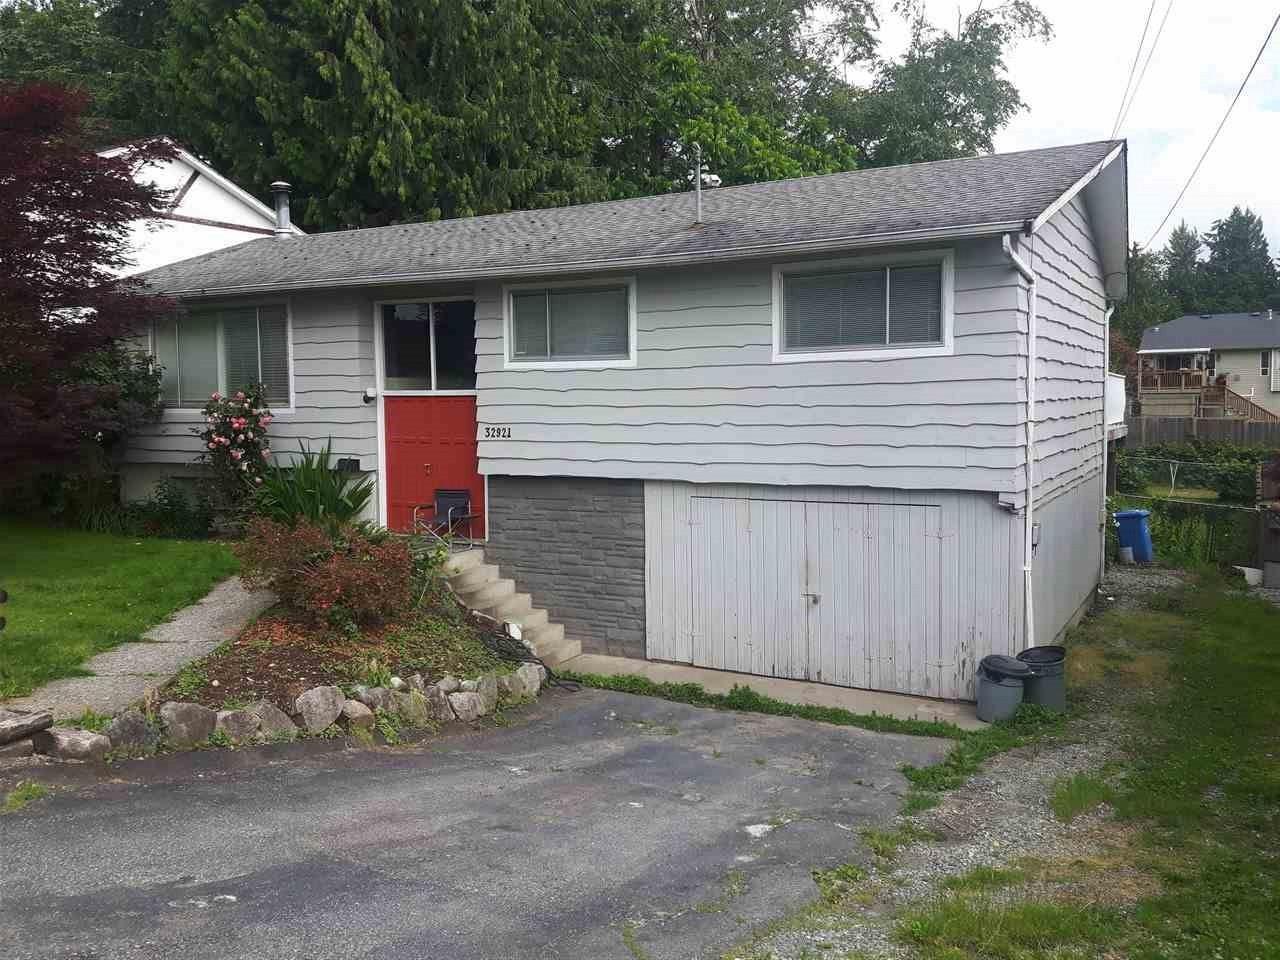 Sold: 32921 12th Avenue, Mission, BC